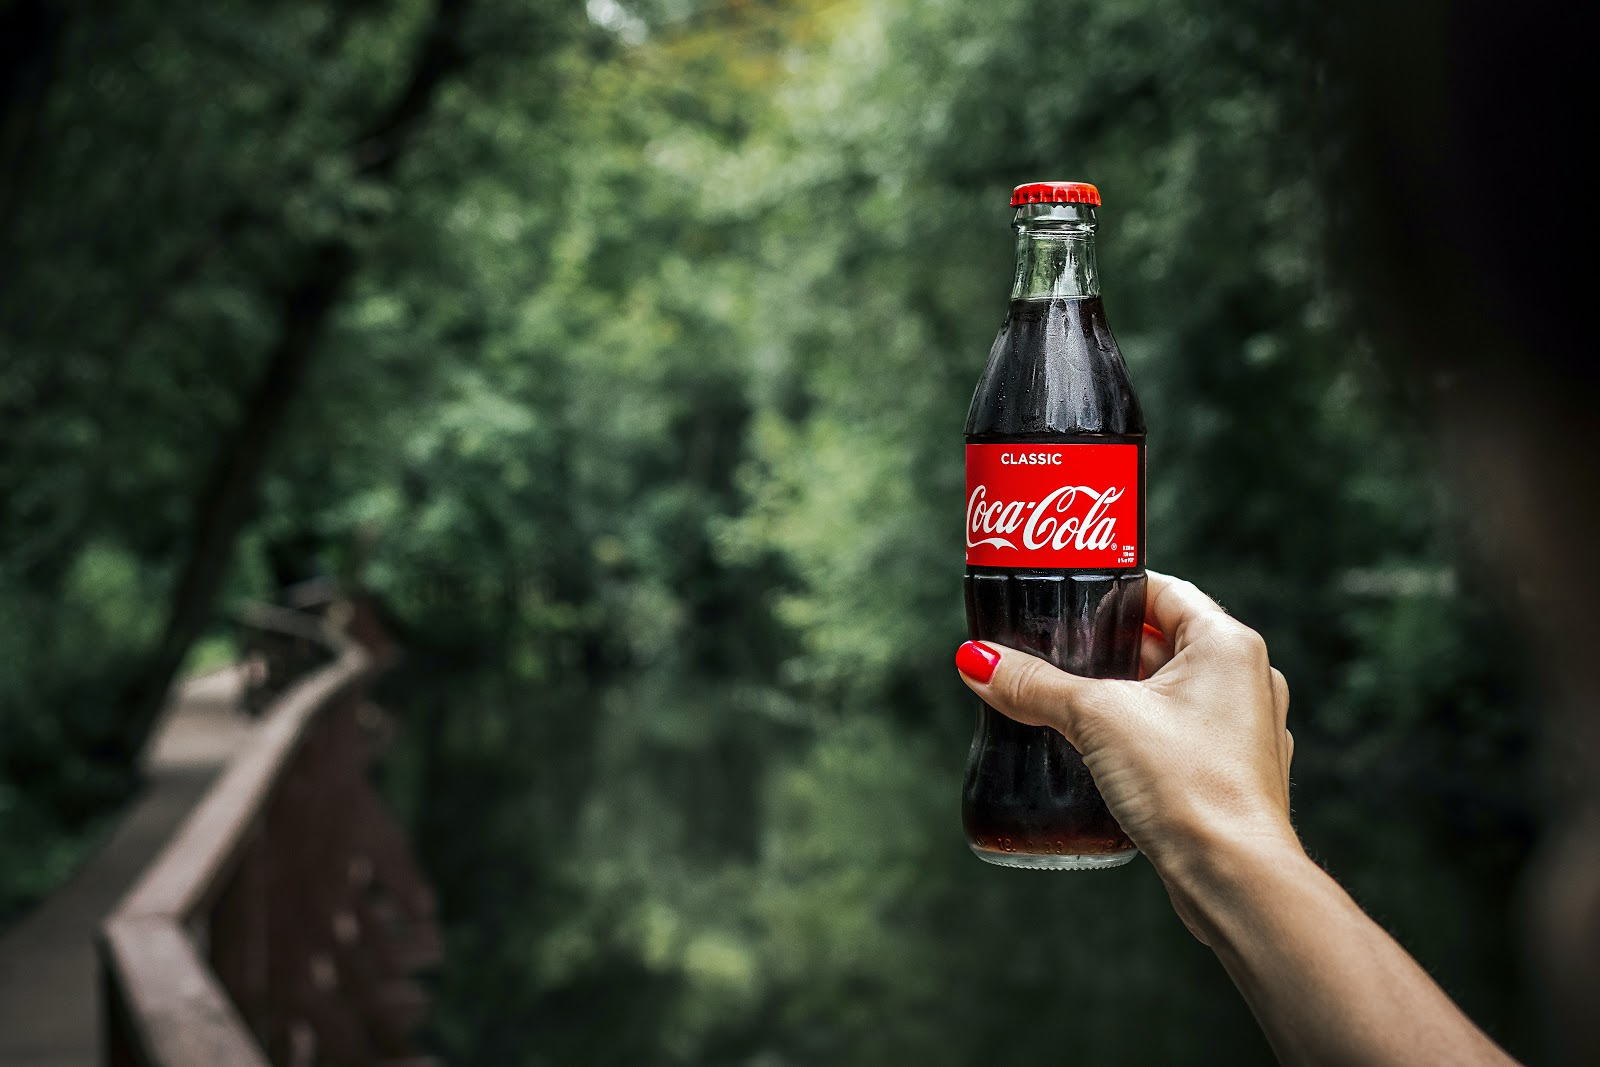 Coca cola bottle - Image credit: pexels.com